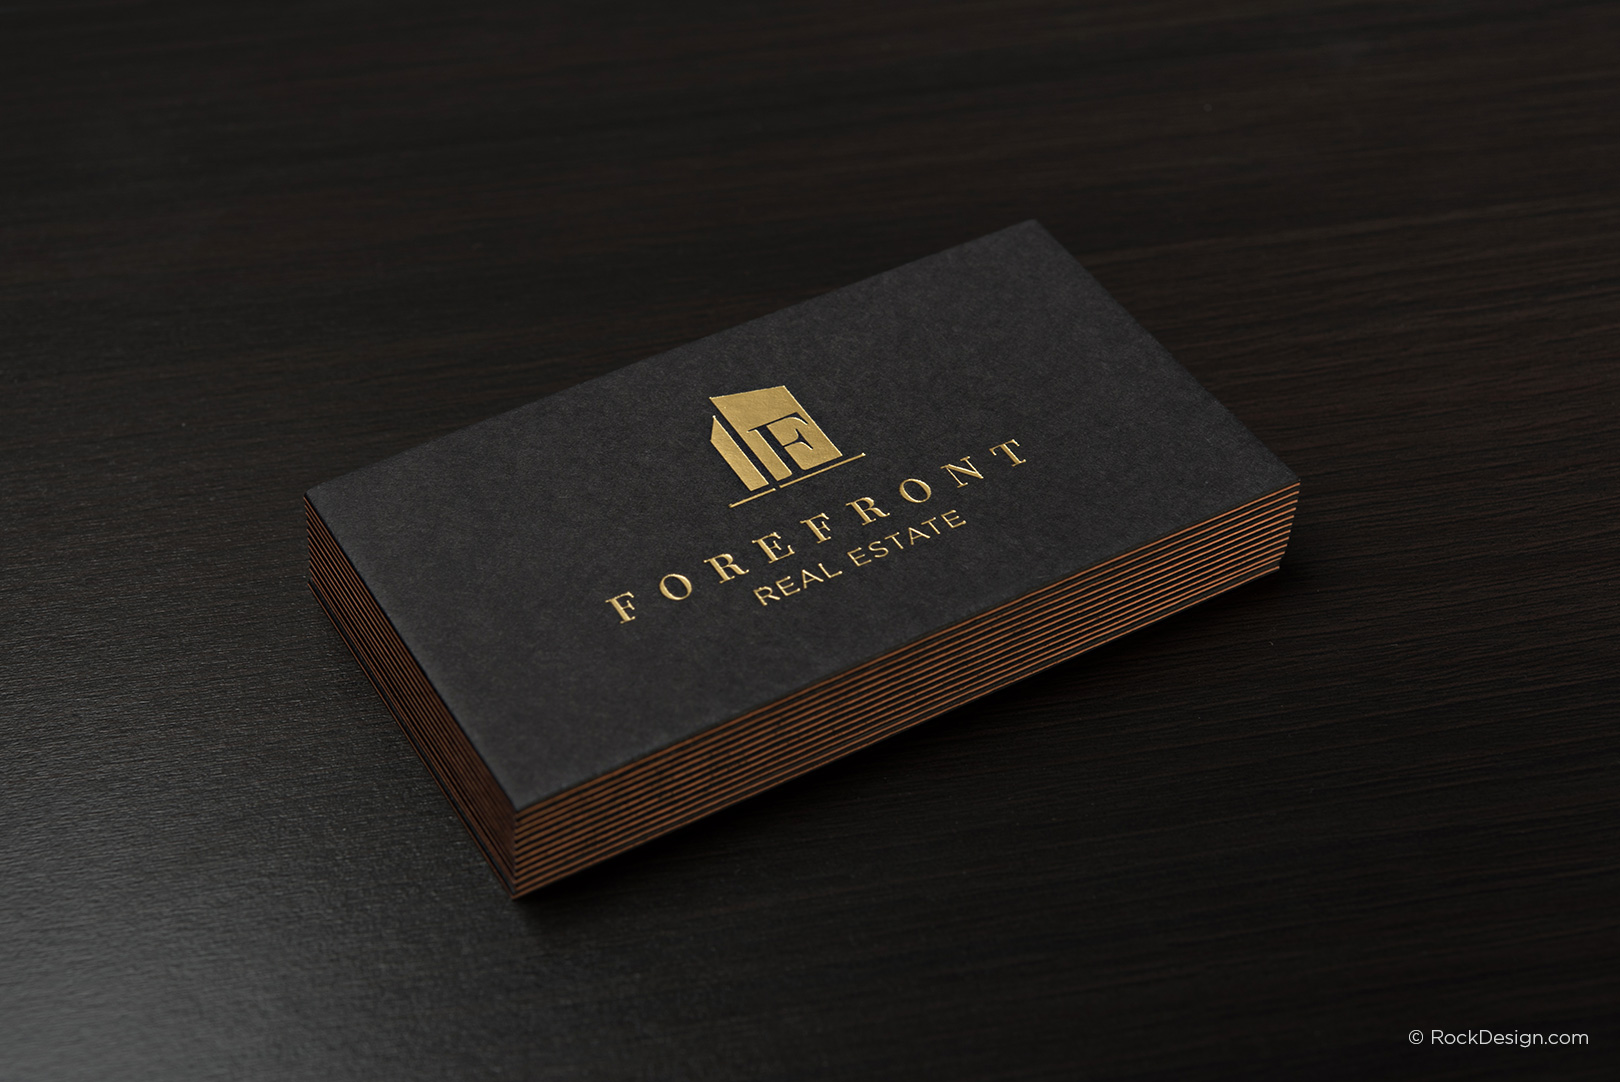 Foil stamp business cards gallery free business cards luxury business cards format for writing a resignation letter mind foil stamping rockdesign luxury business card magicingreecefo Images